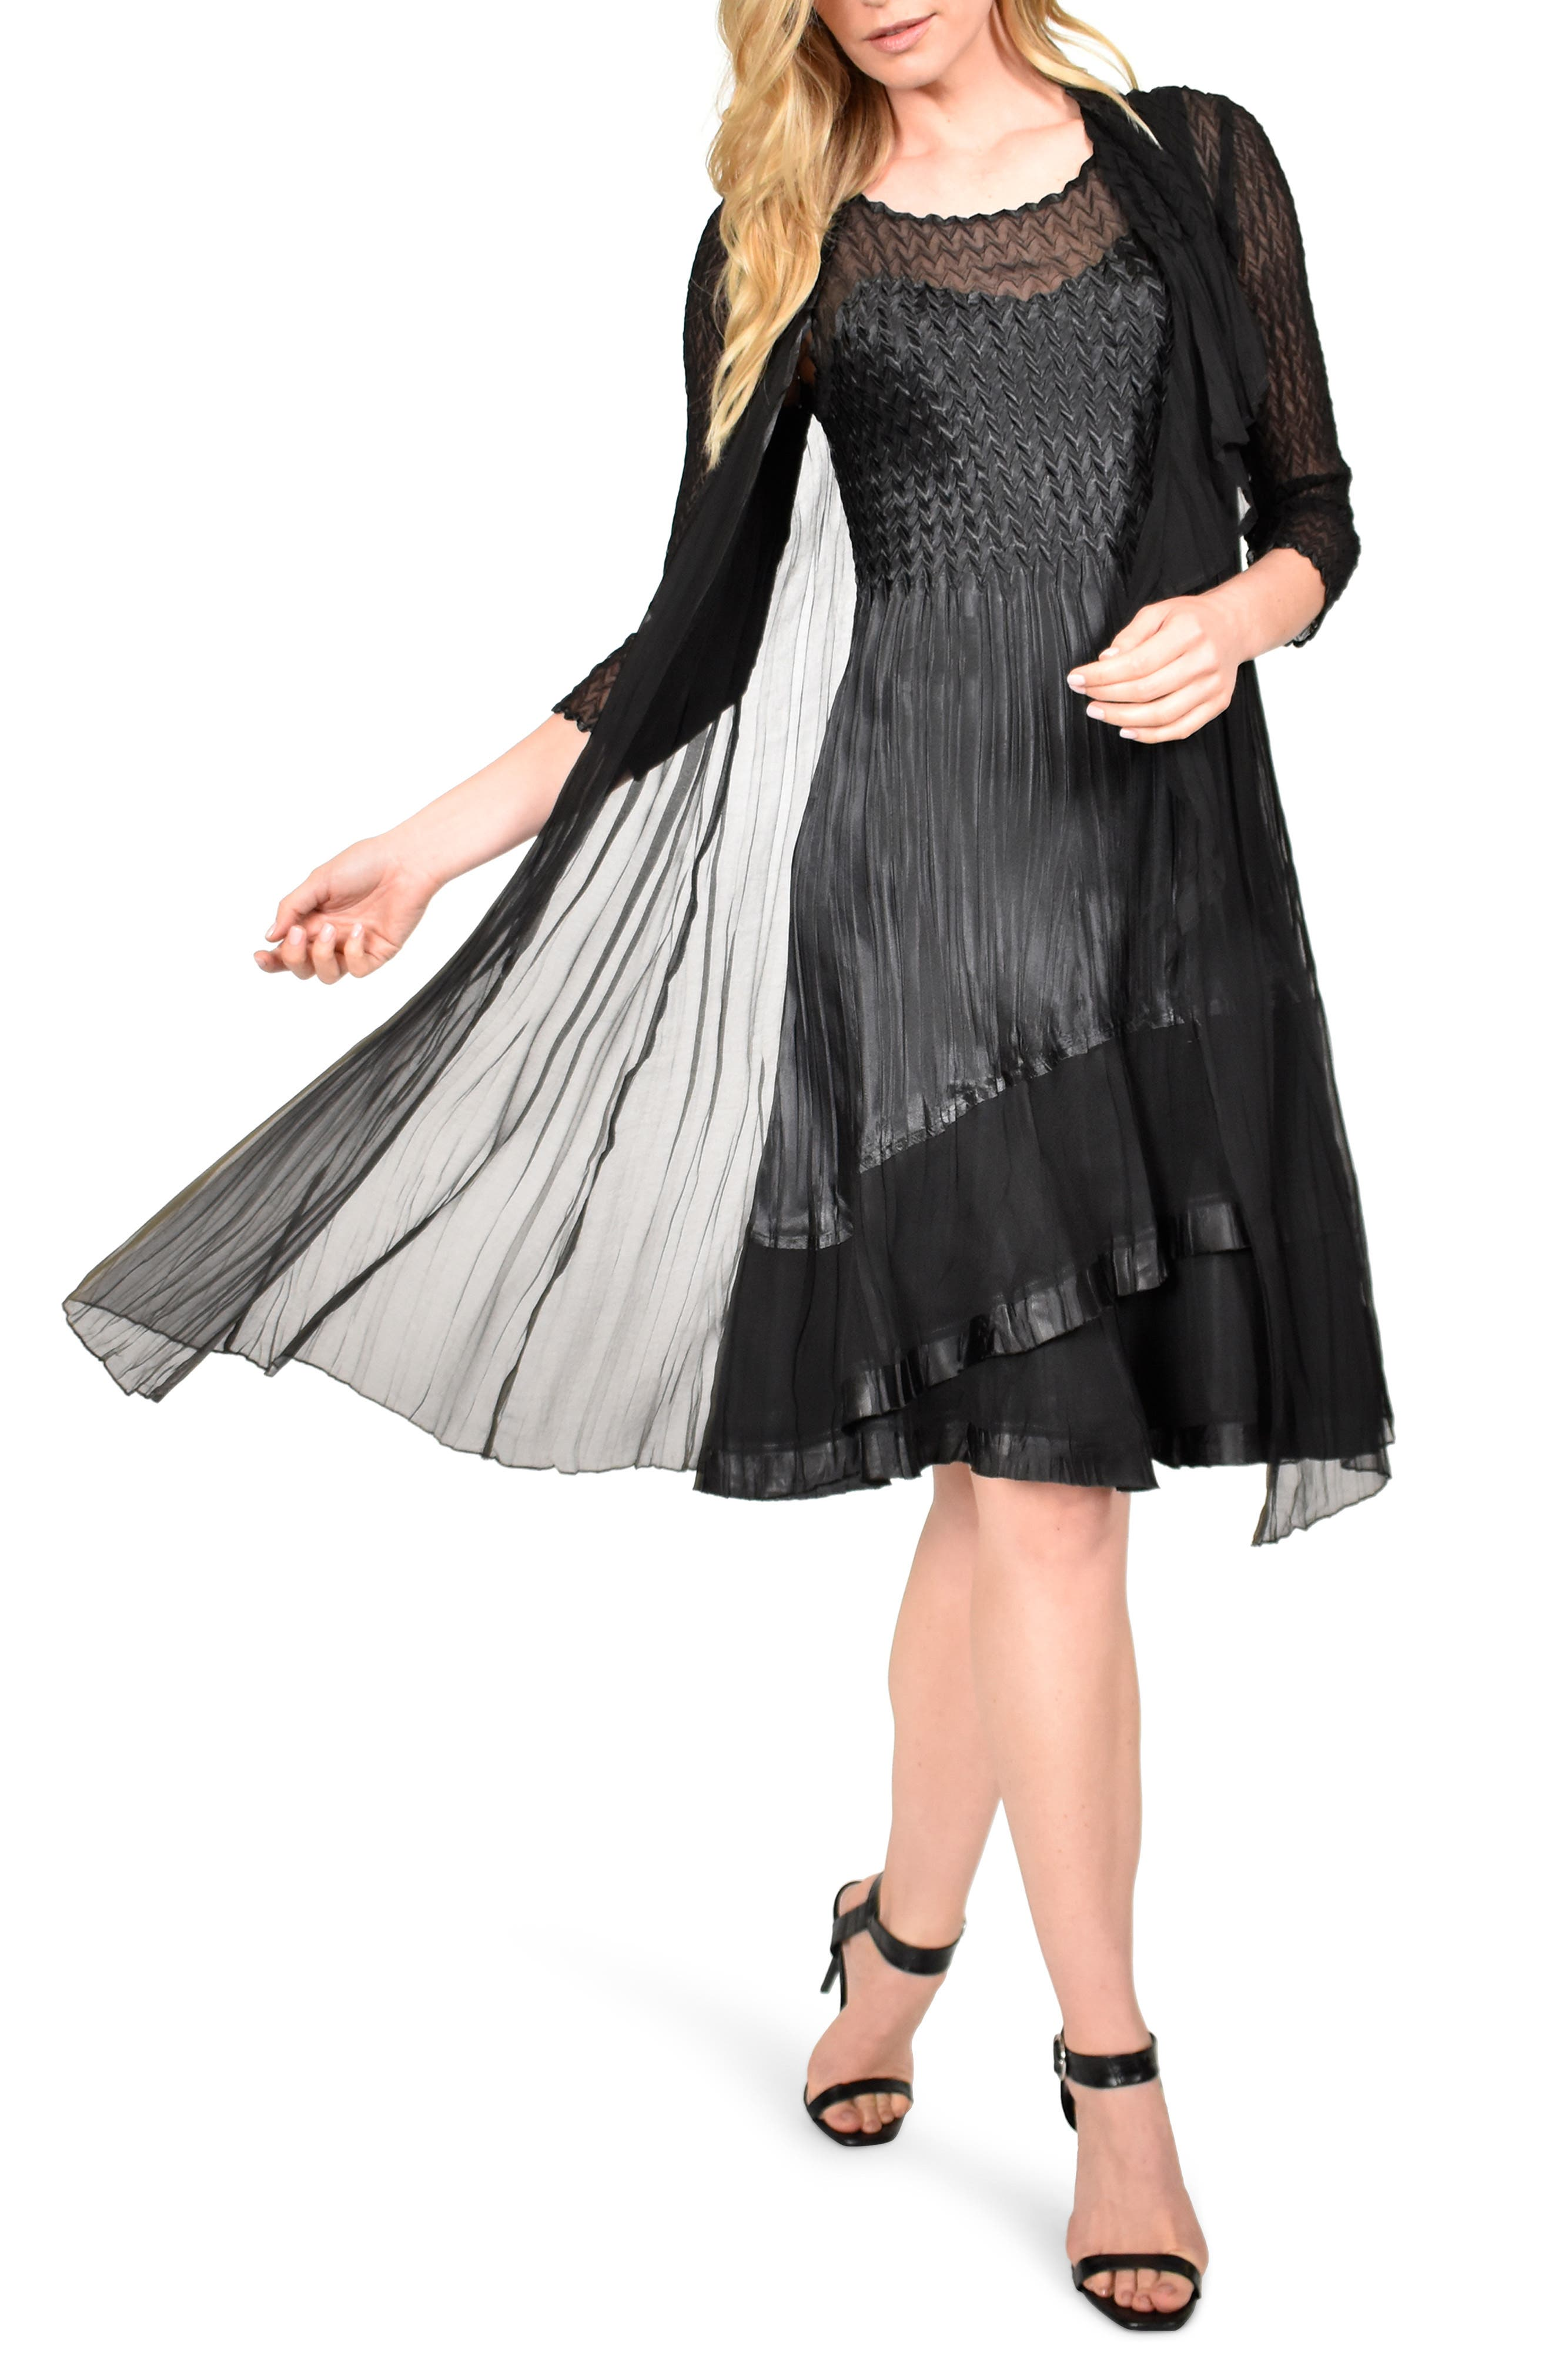 1920s Evening Dresses & Formal Gowns Womens Komarov Charmeuse Dress With Long Jacket $448.00 AT vintagedancer.com